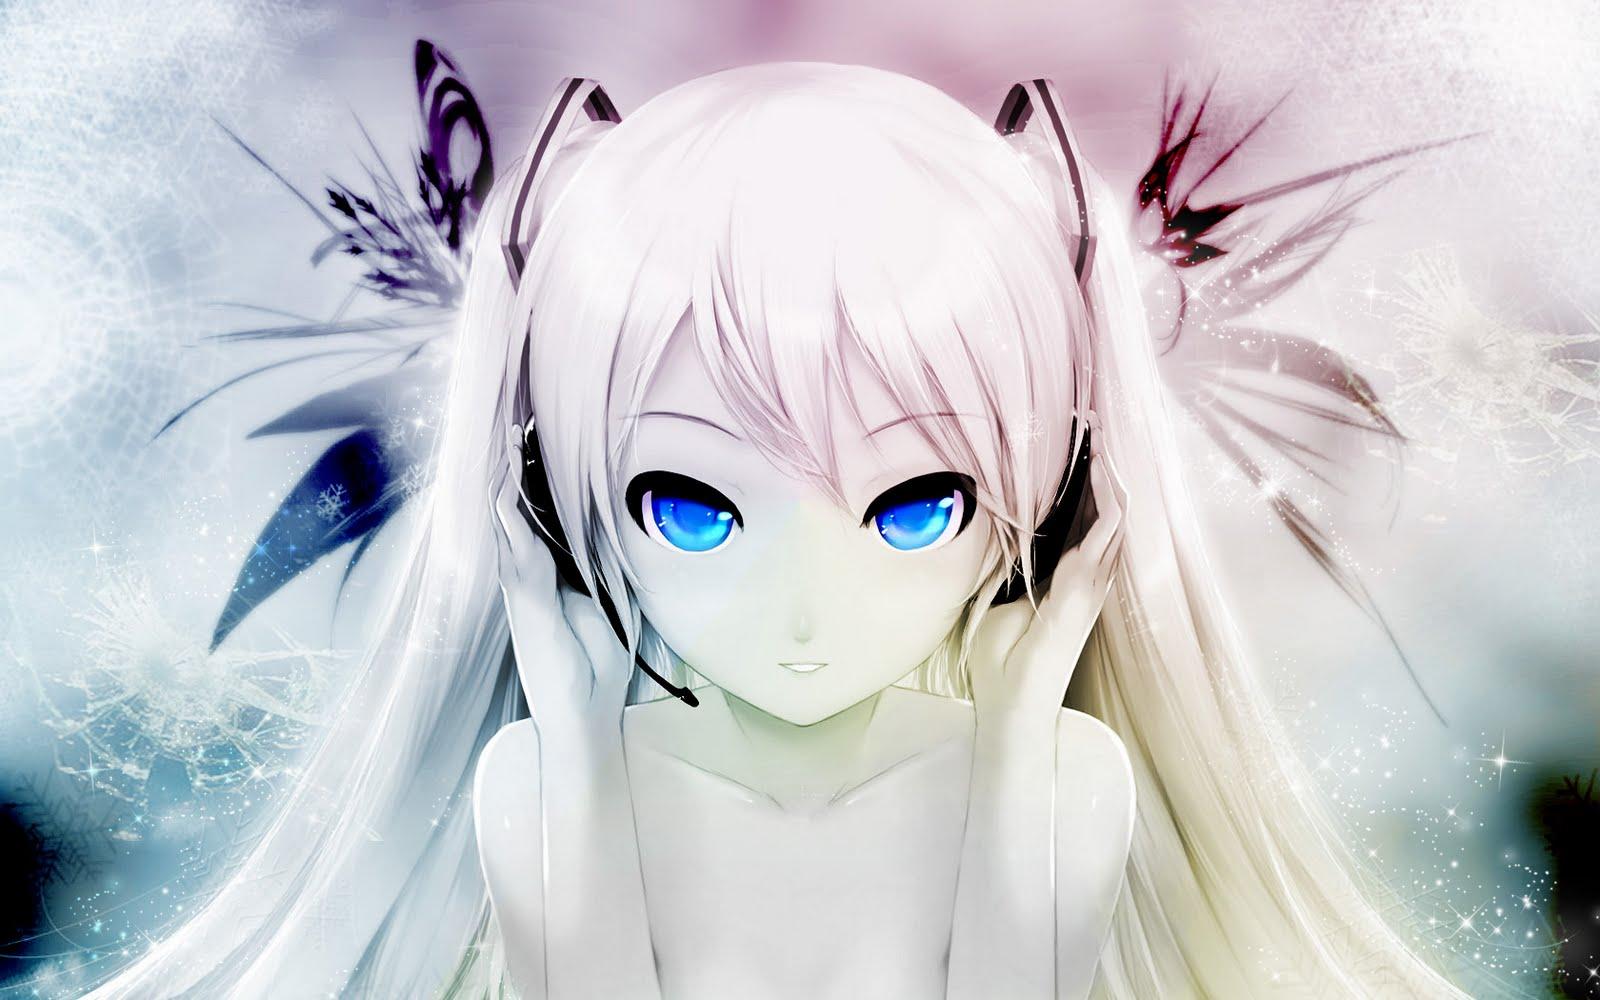 Crystal White For PS Vita In June & Hatsune Miku Surprise